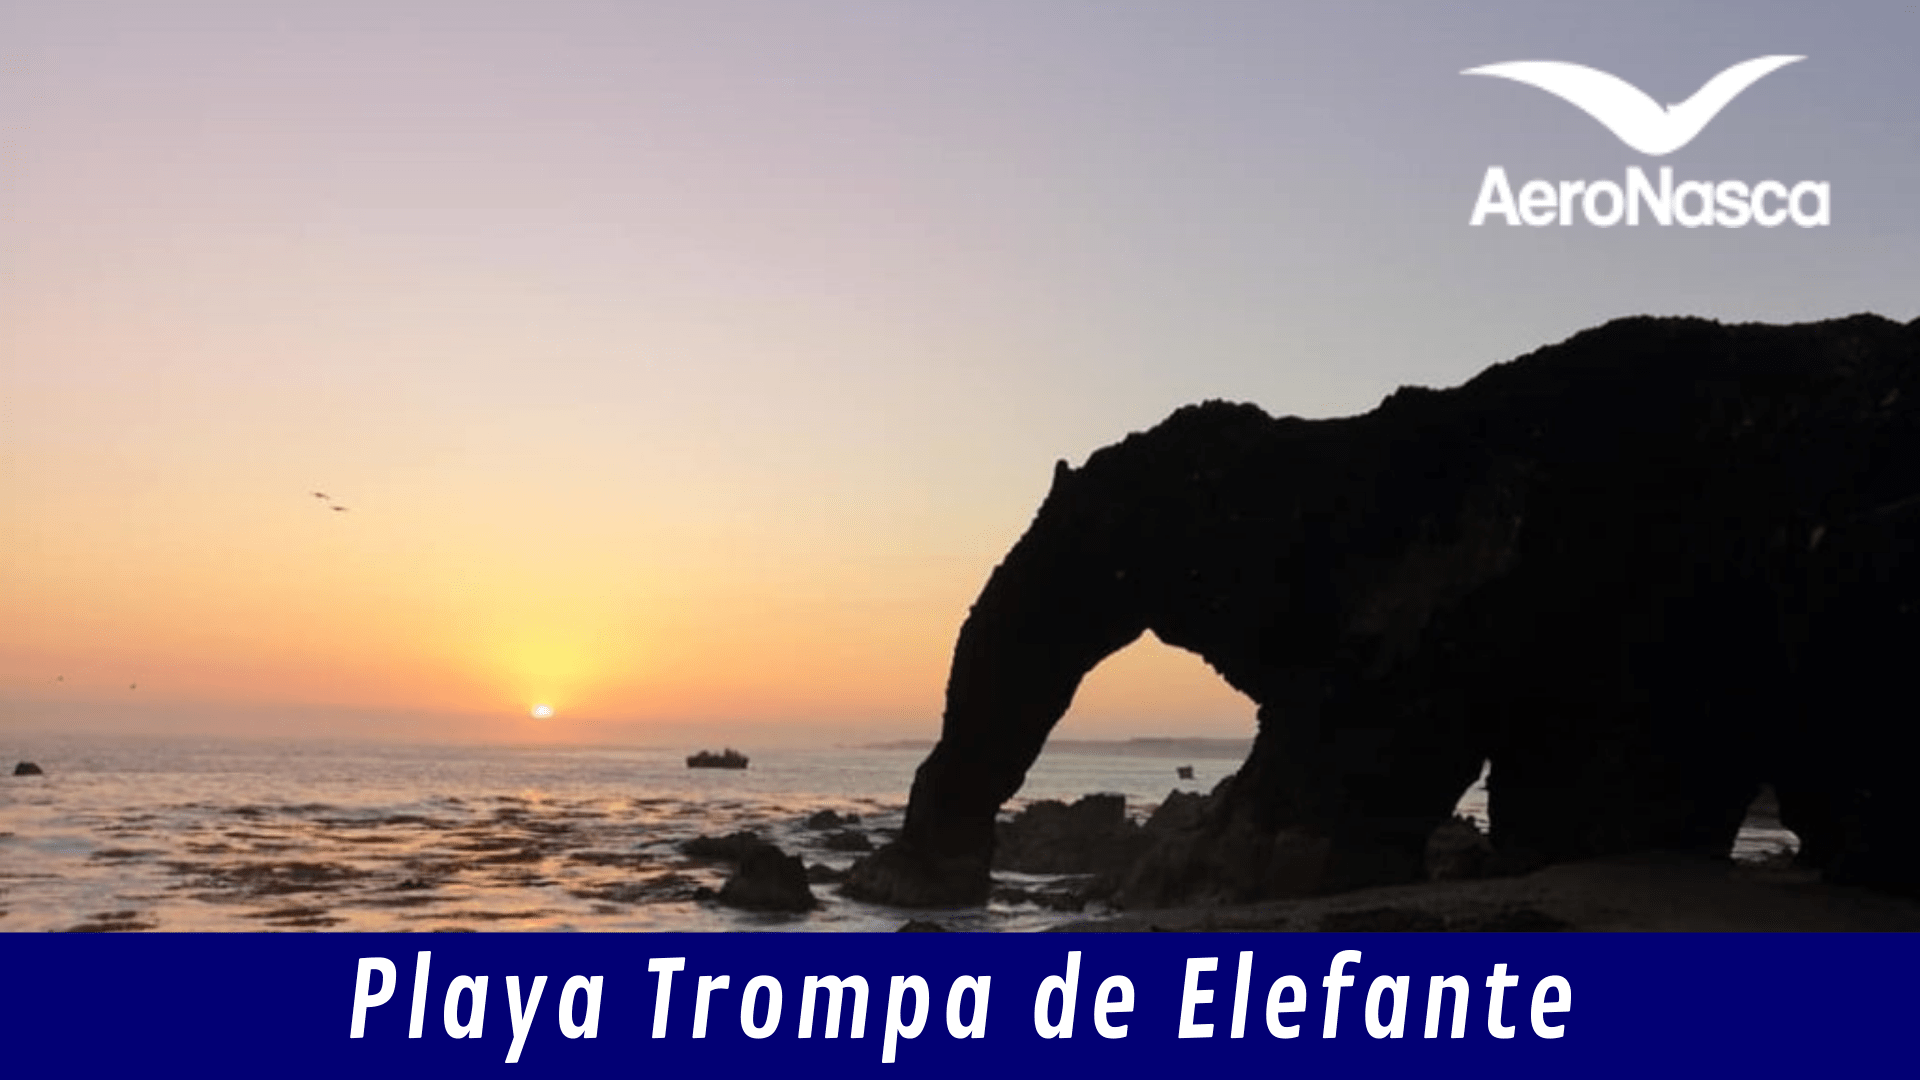 Playa Trompa De Elefante